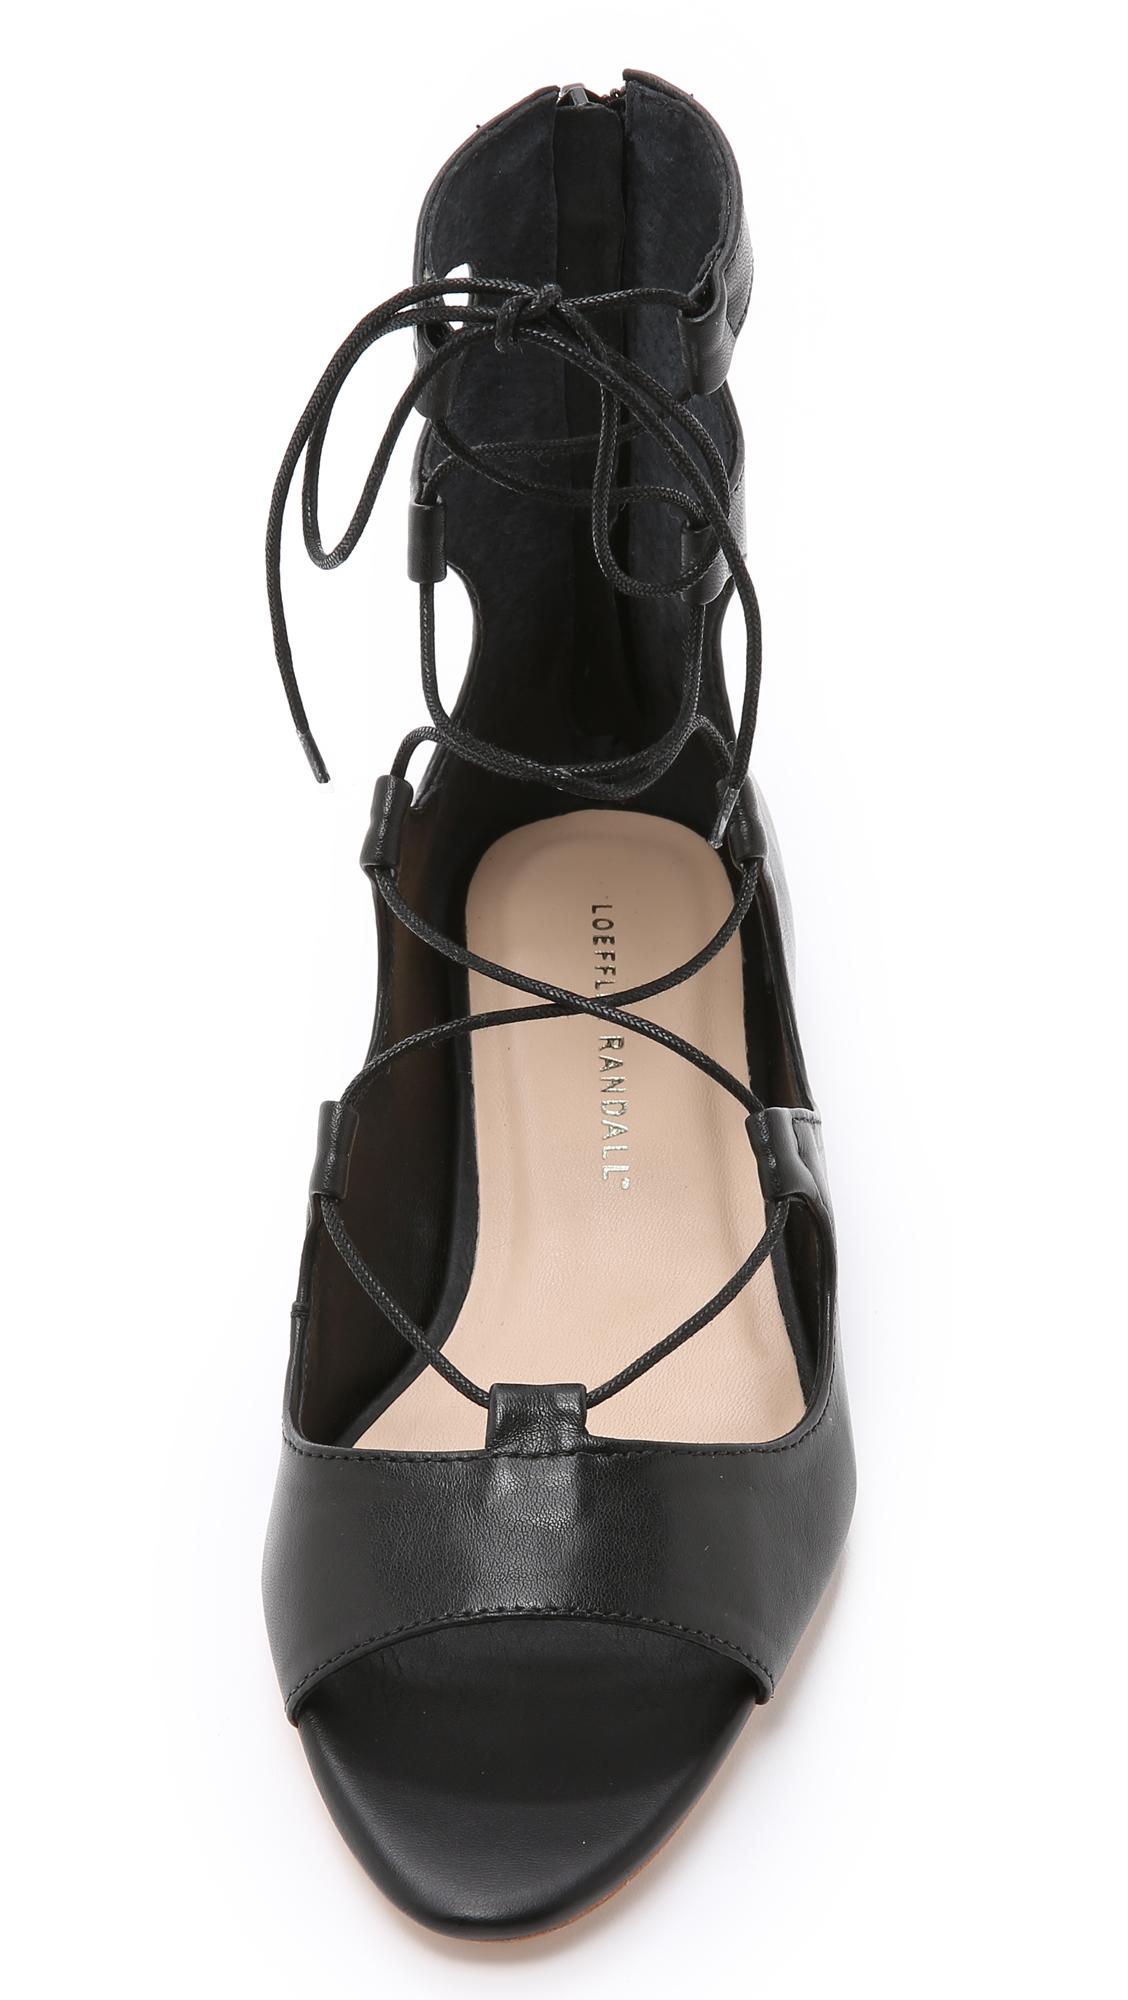 934b3a4ecc79 Loeffler Randall Dani Gladiator Sandals